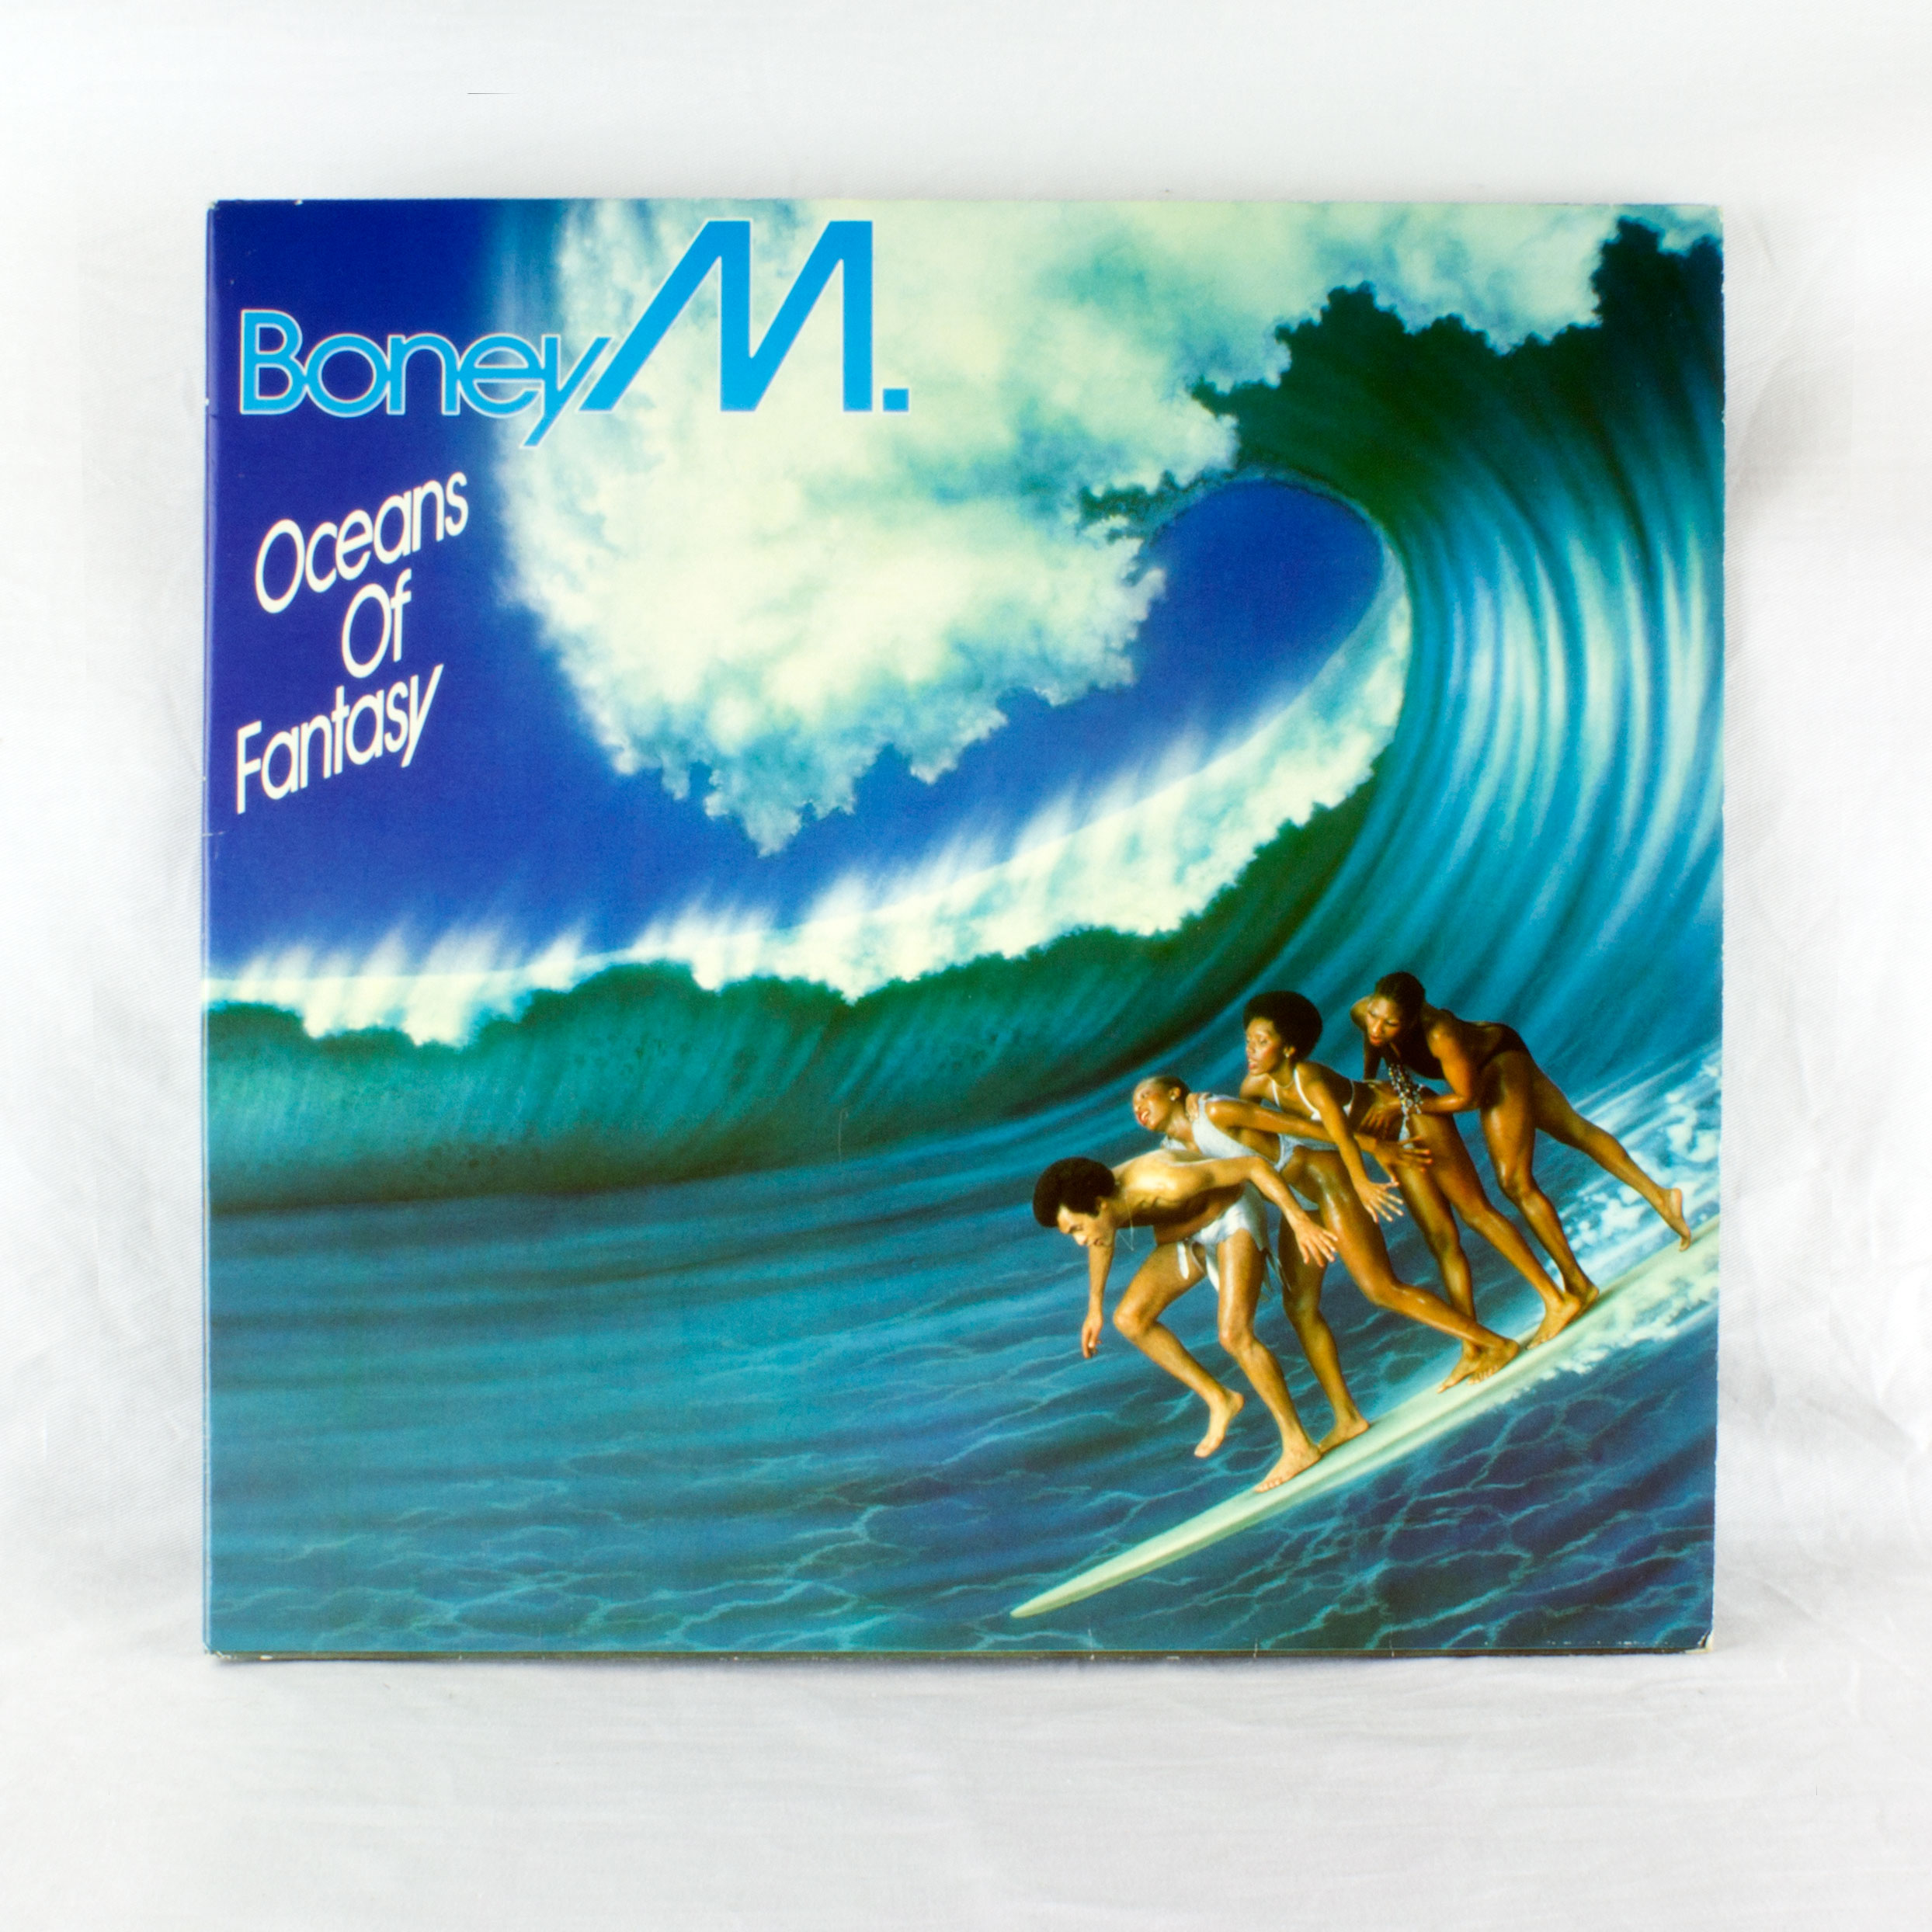 boney m oc ans de 39 fantasy 39 fantaisie musique disque vinyle album ebay. Black Bedroom Furniture Sets. Home Design Ideas